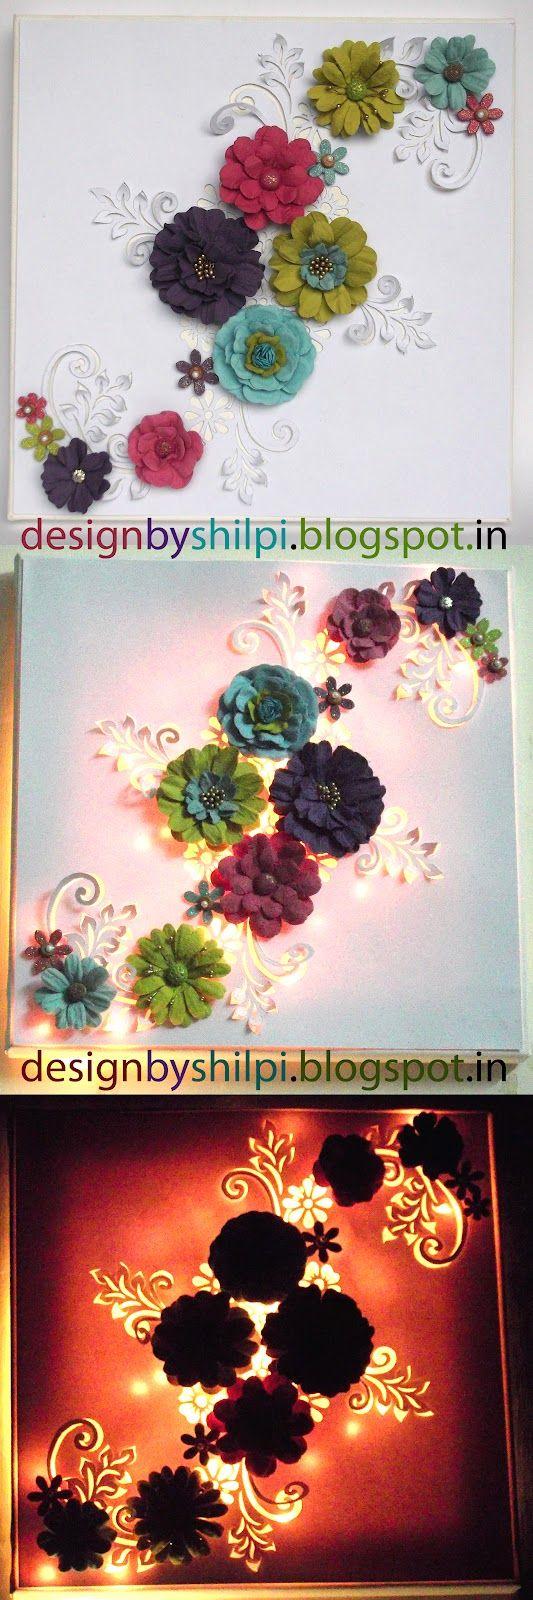 Design By shilpi: Lighted Floral CANVAS